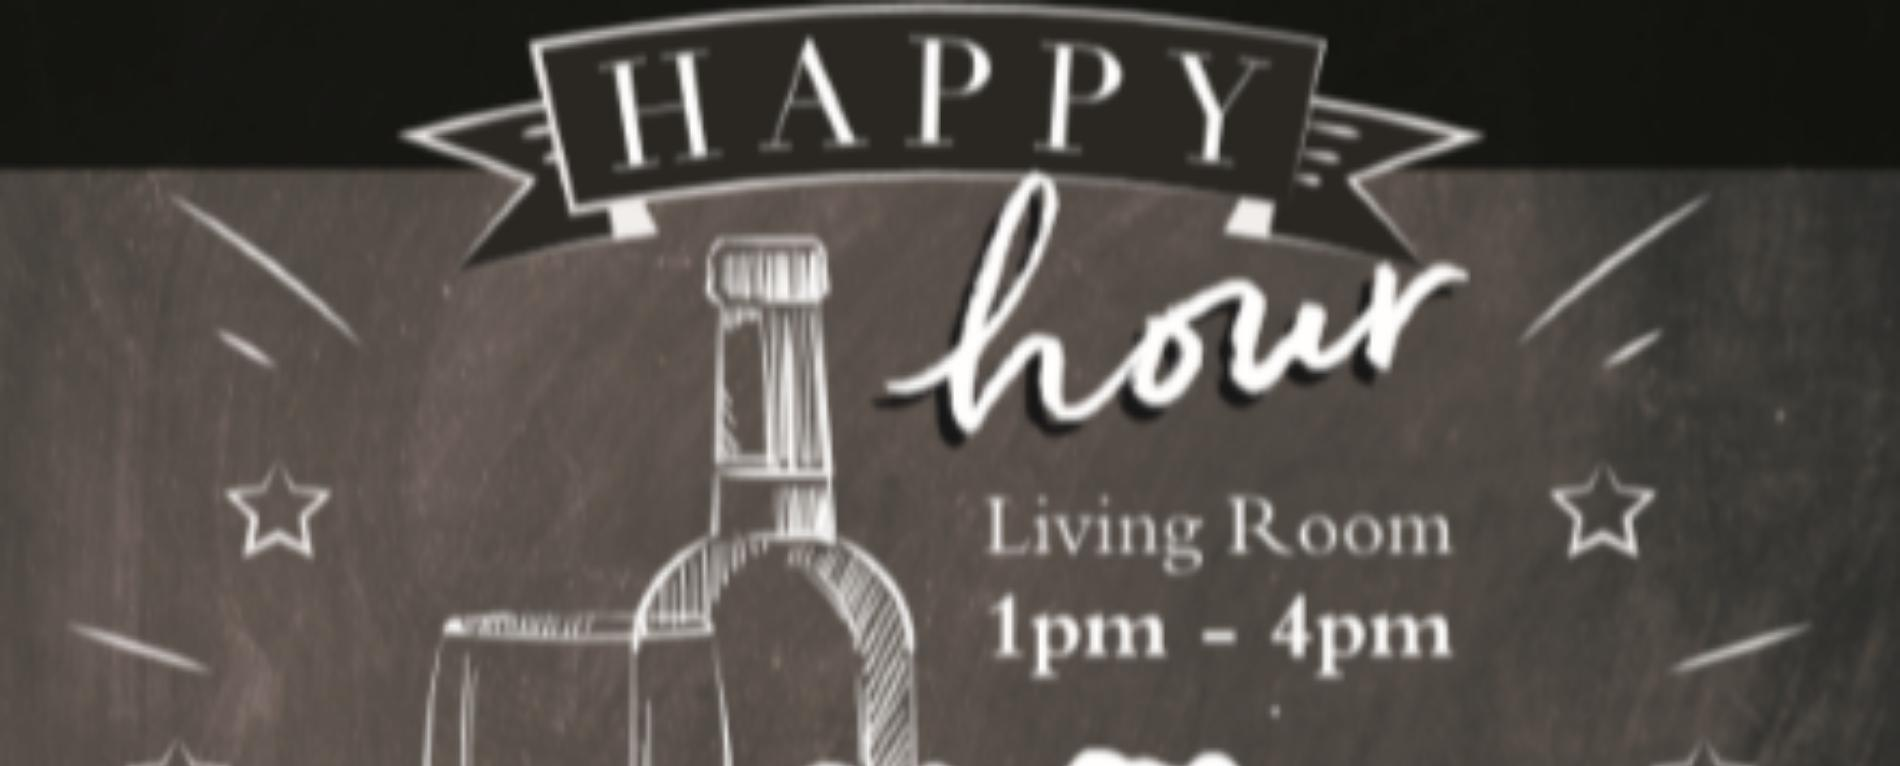 HAPPY HOUR: Buy 100 get 100 Free at Living Room - International deals